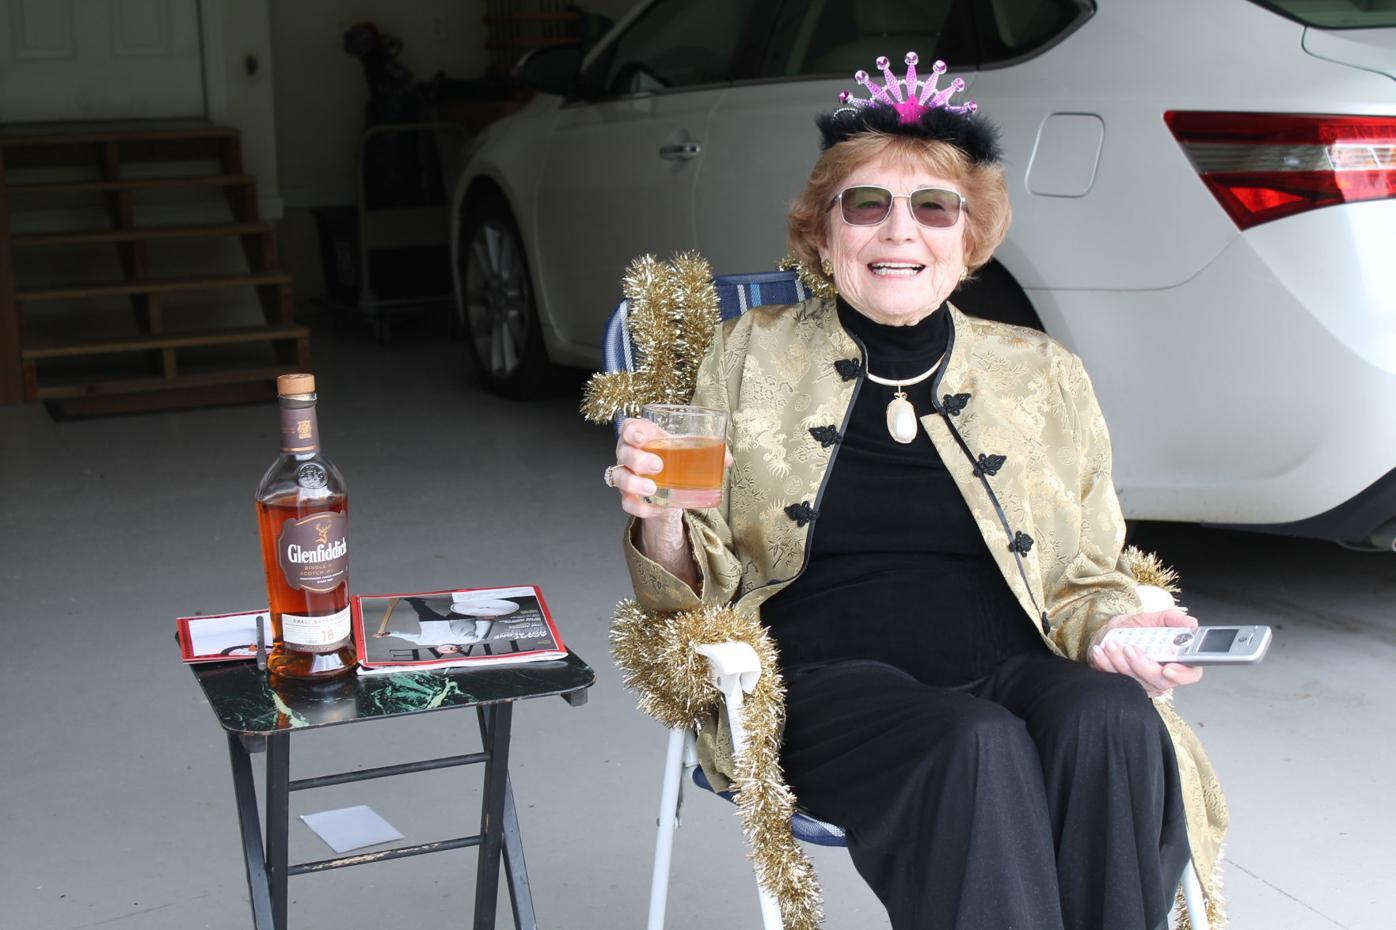 An unconventional birthday celebration